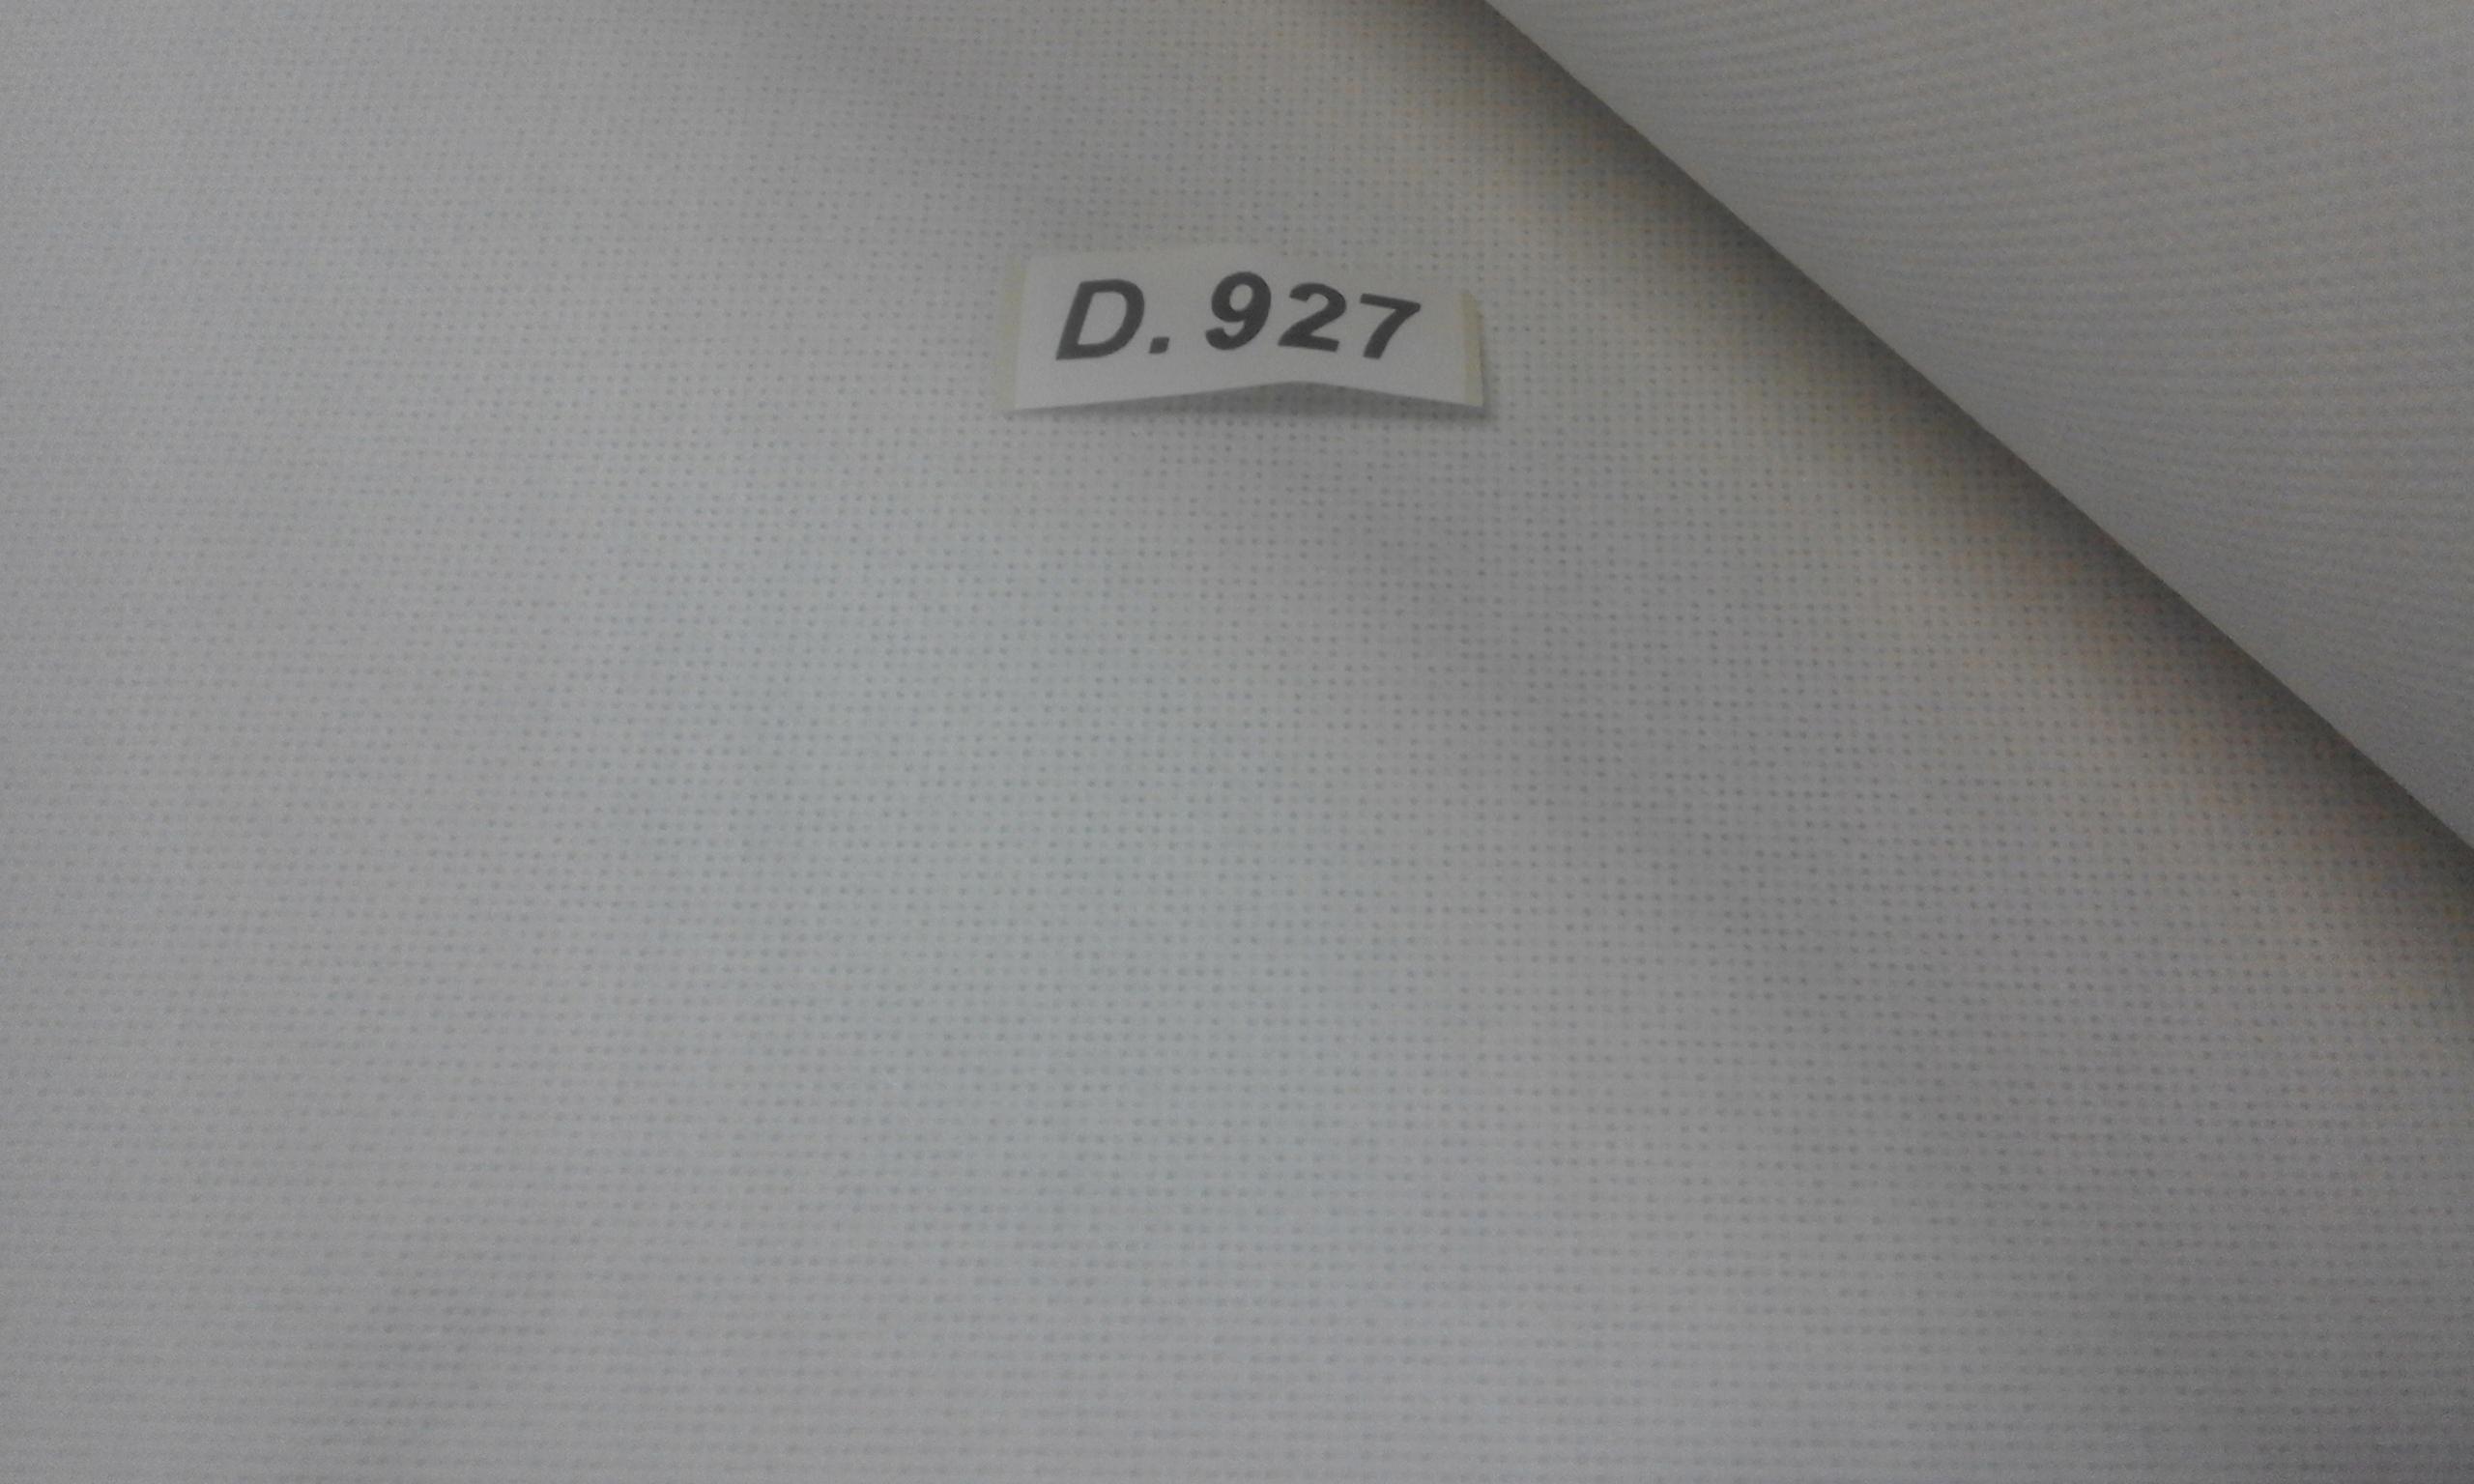 Sztywni do torebek k.biały s.0.90 m za 3 m D.927